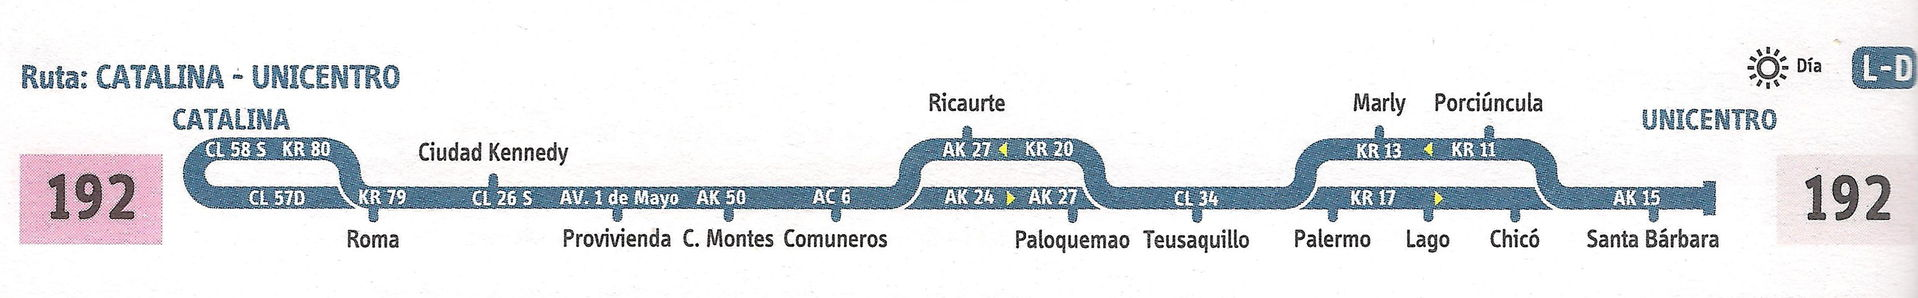 Ruta SITP: 192 Catalina ↔ Unicentro [Urbana] 3